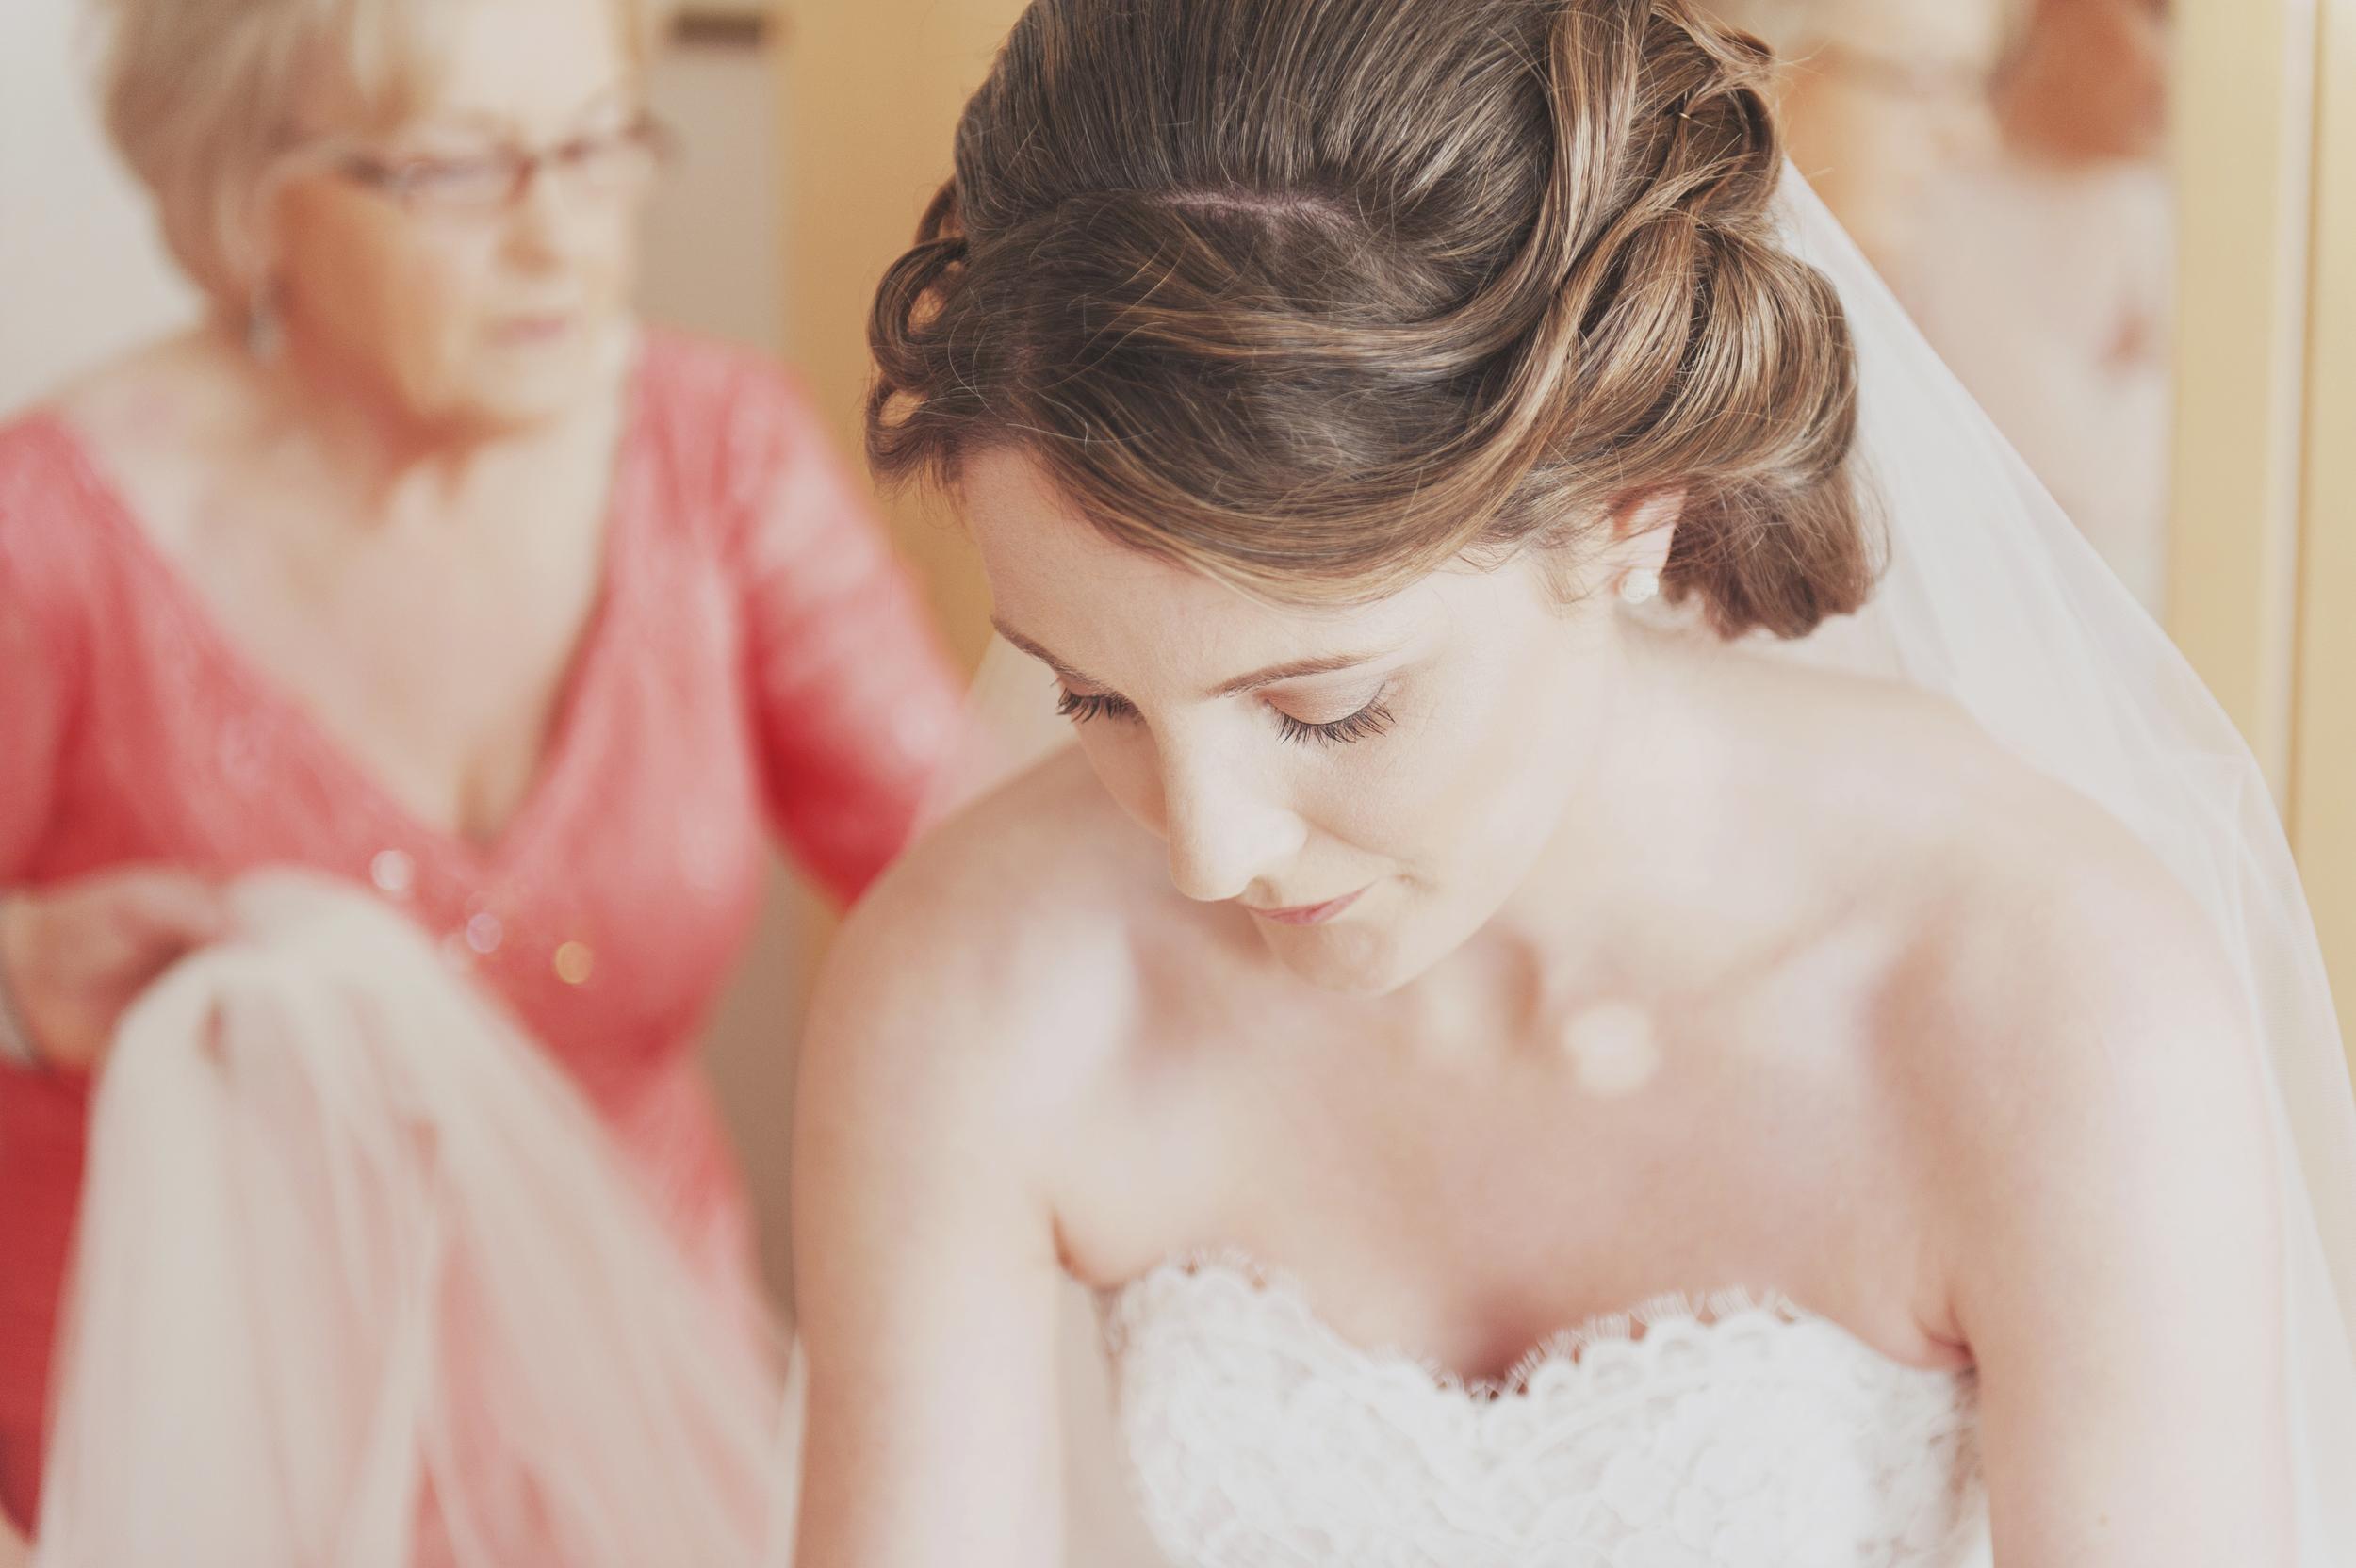 Carton_House_Wedding_Photography_Maynooth_Ireland_020.jpg